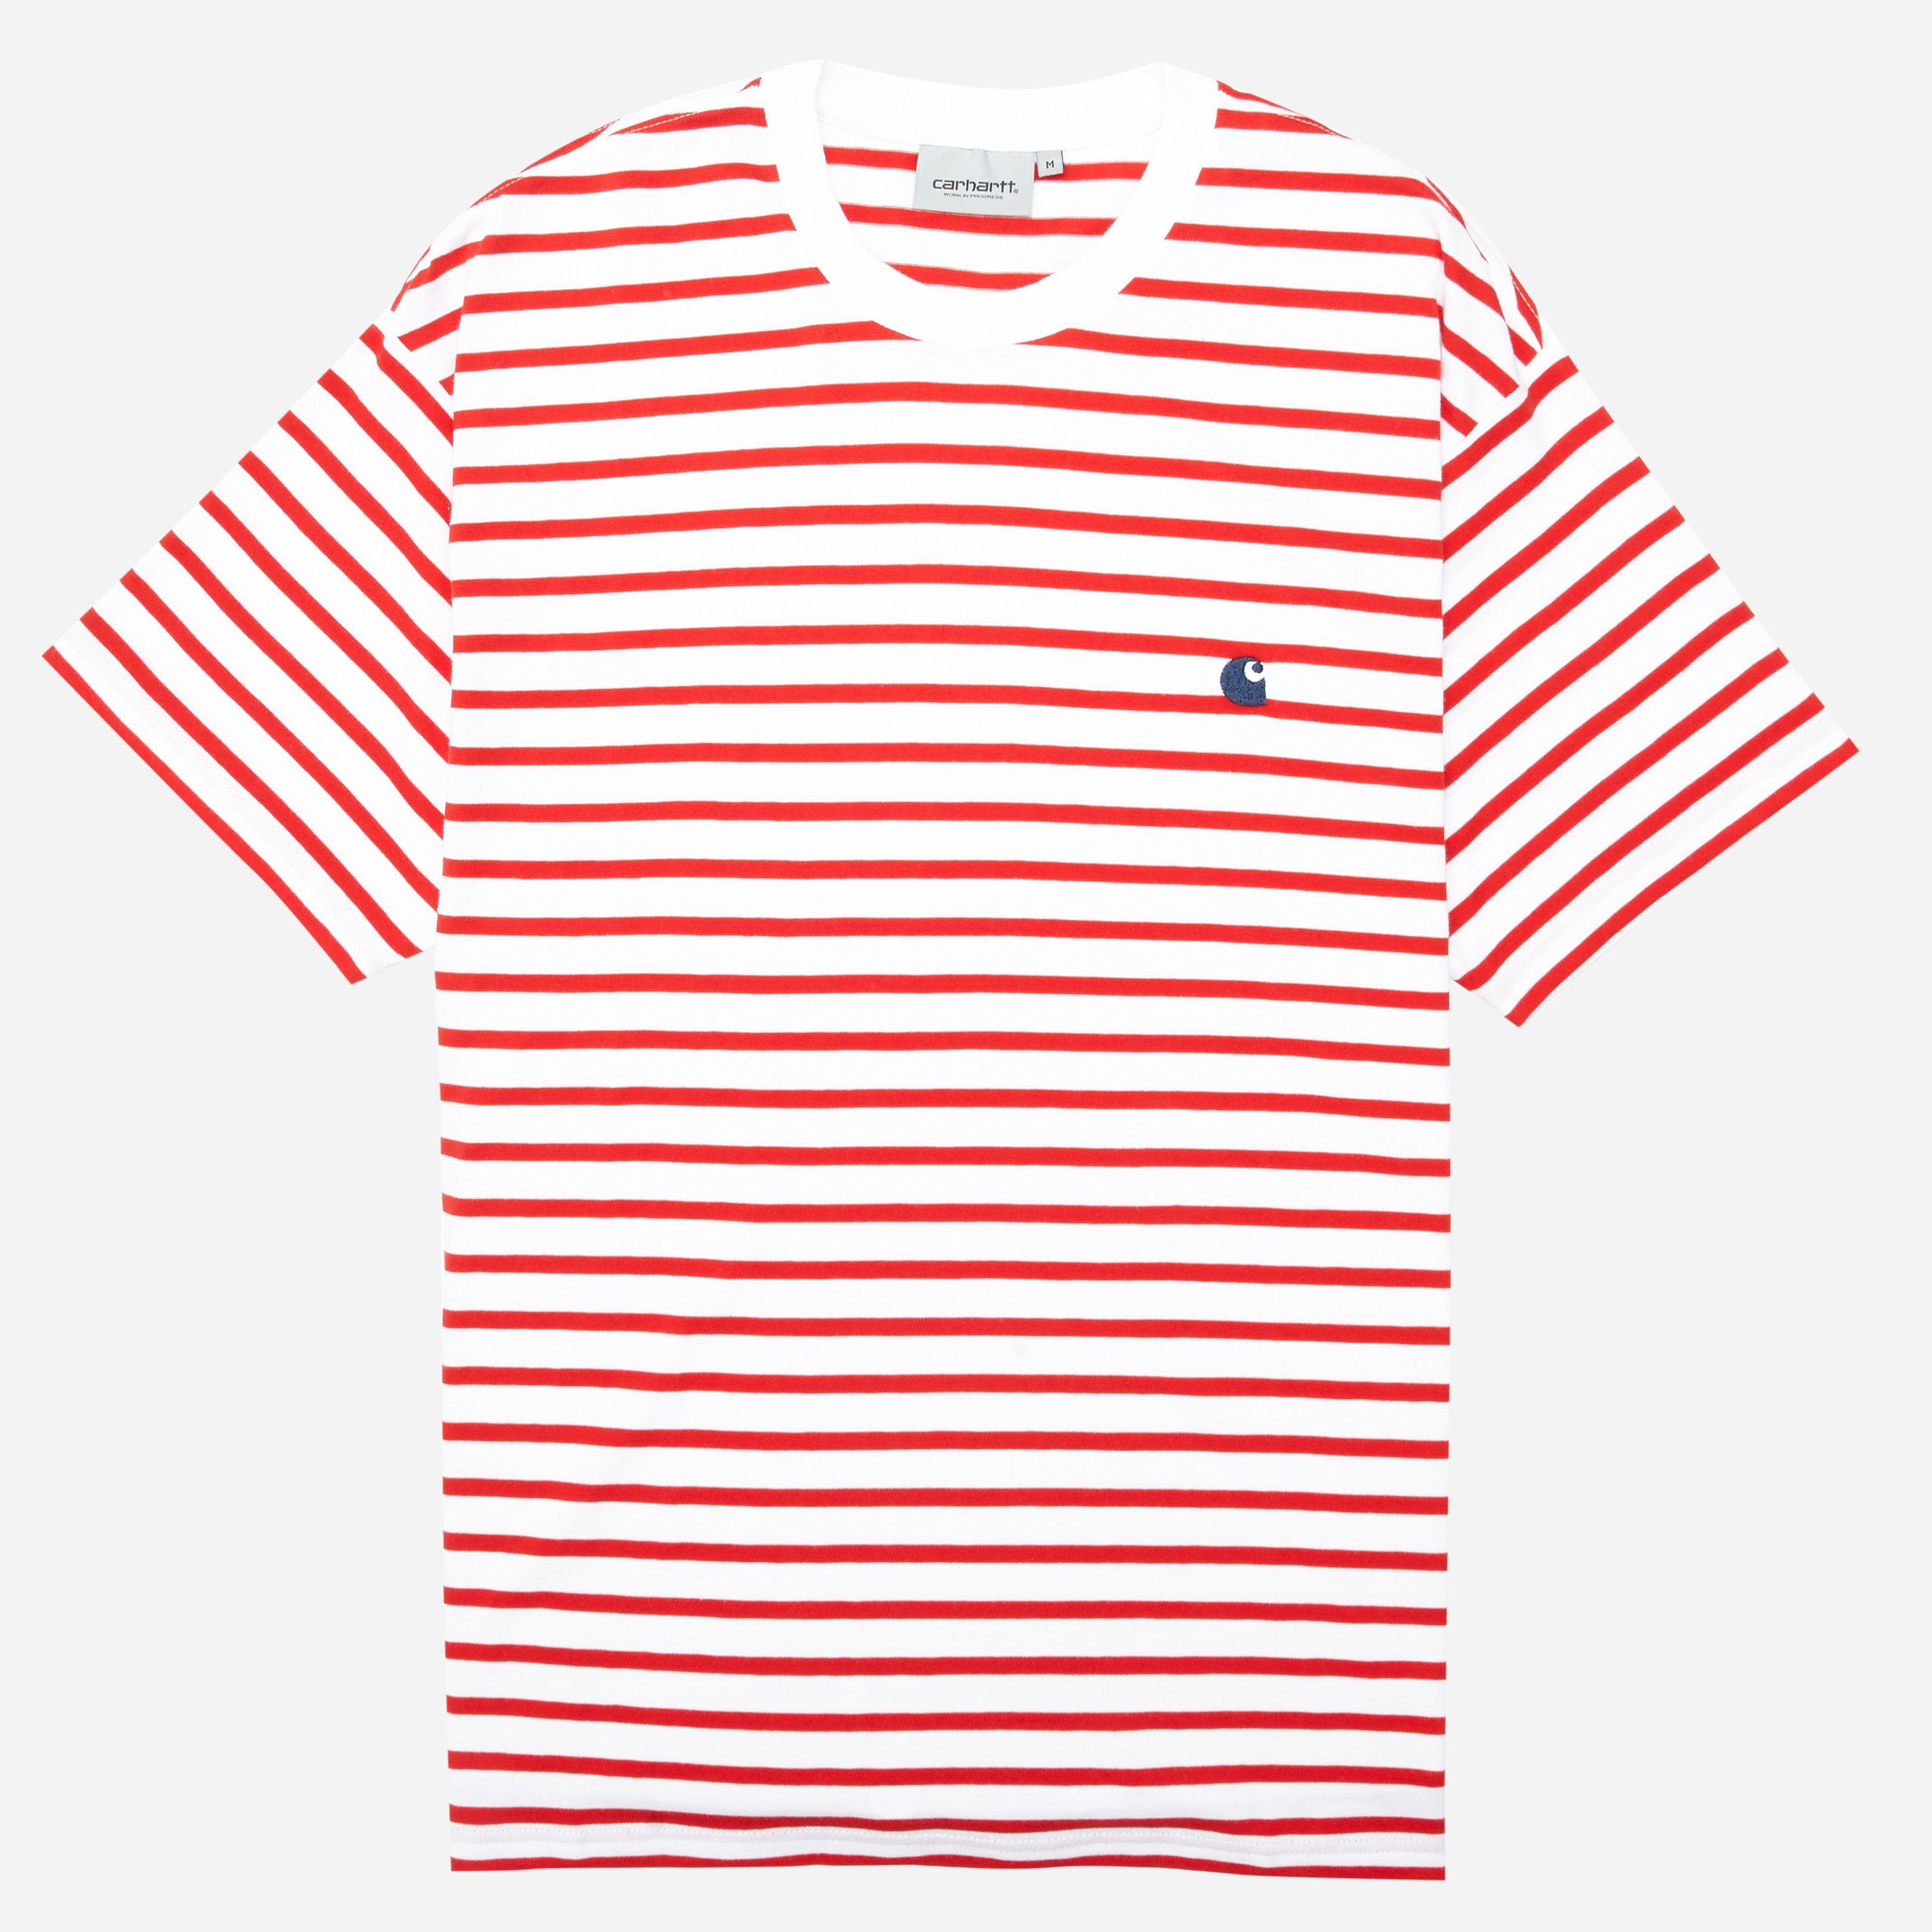 Carhartt WIP Champ T-shirt